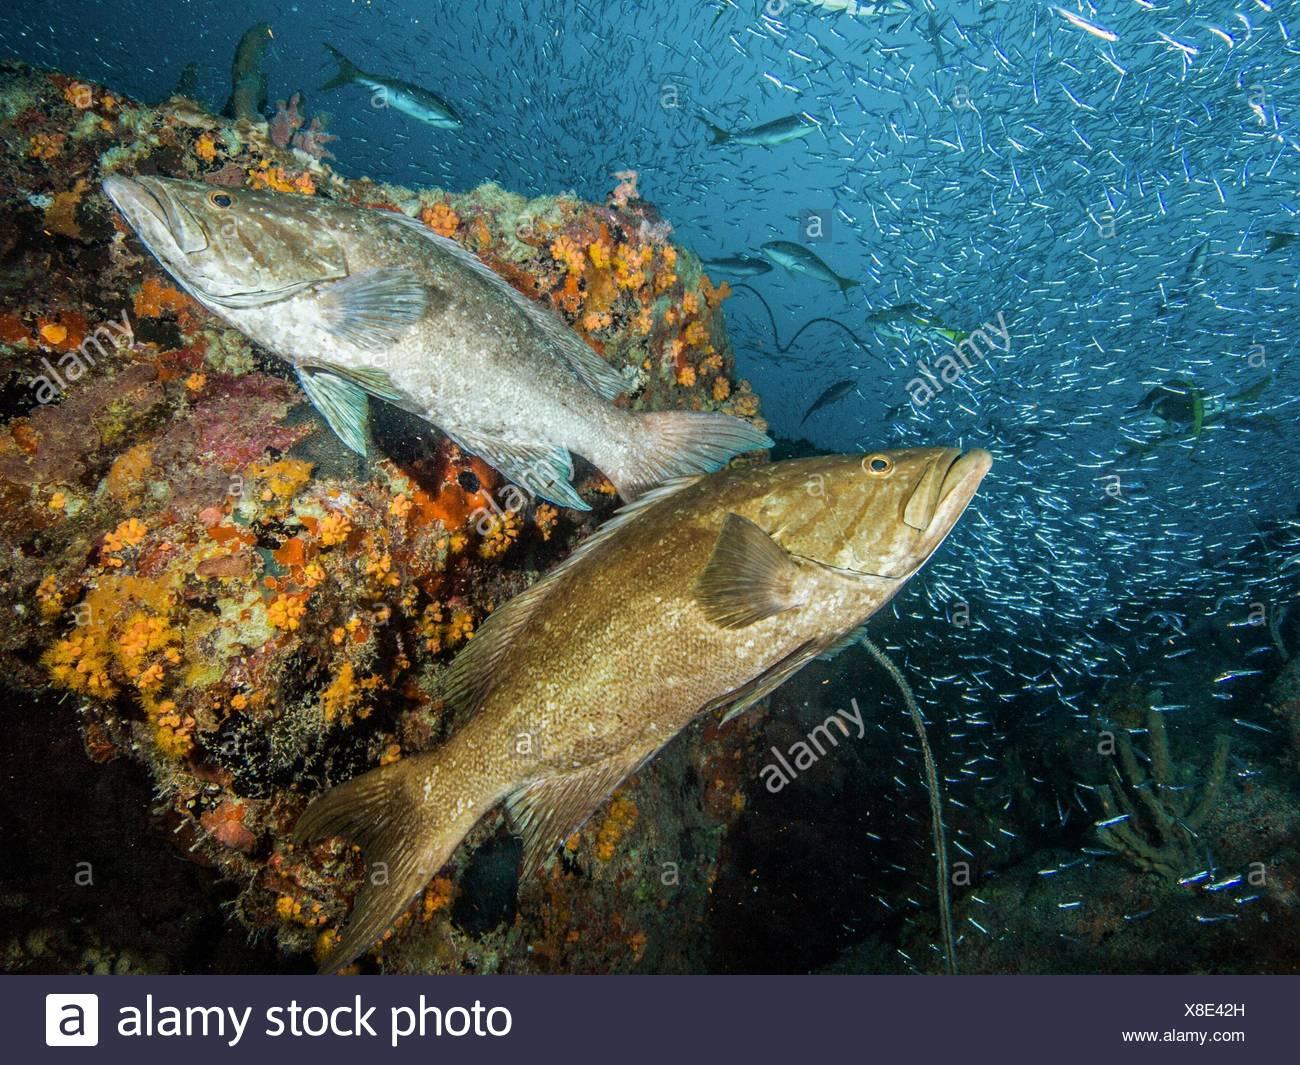 Feeding Aggregation Stage - 2 animals-Mycteroperca acutirostris- los roques venezuela - Stock Image